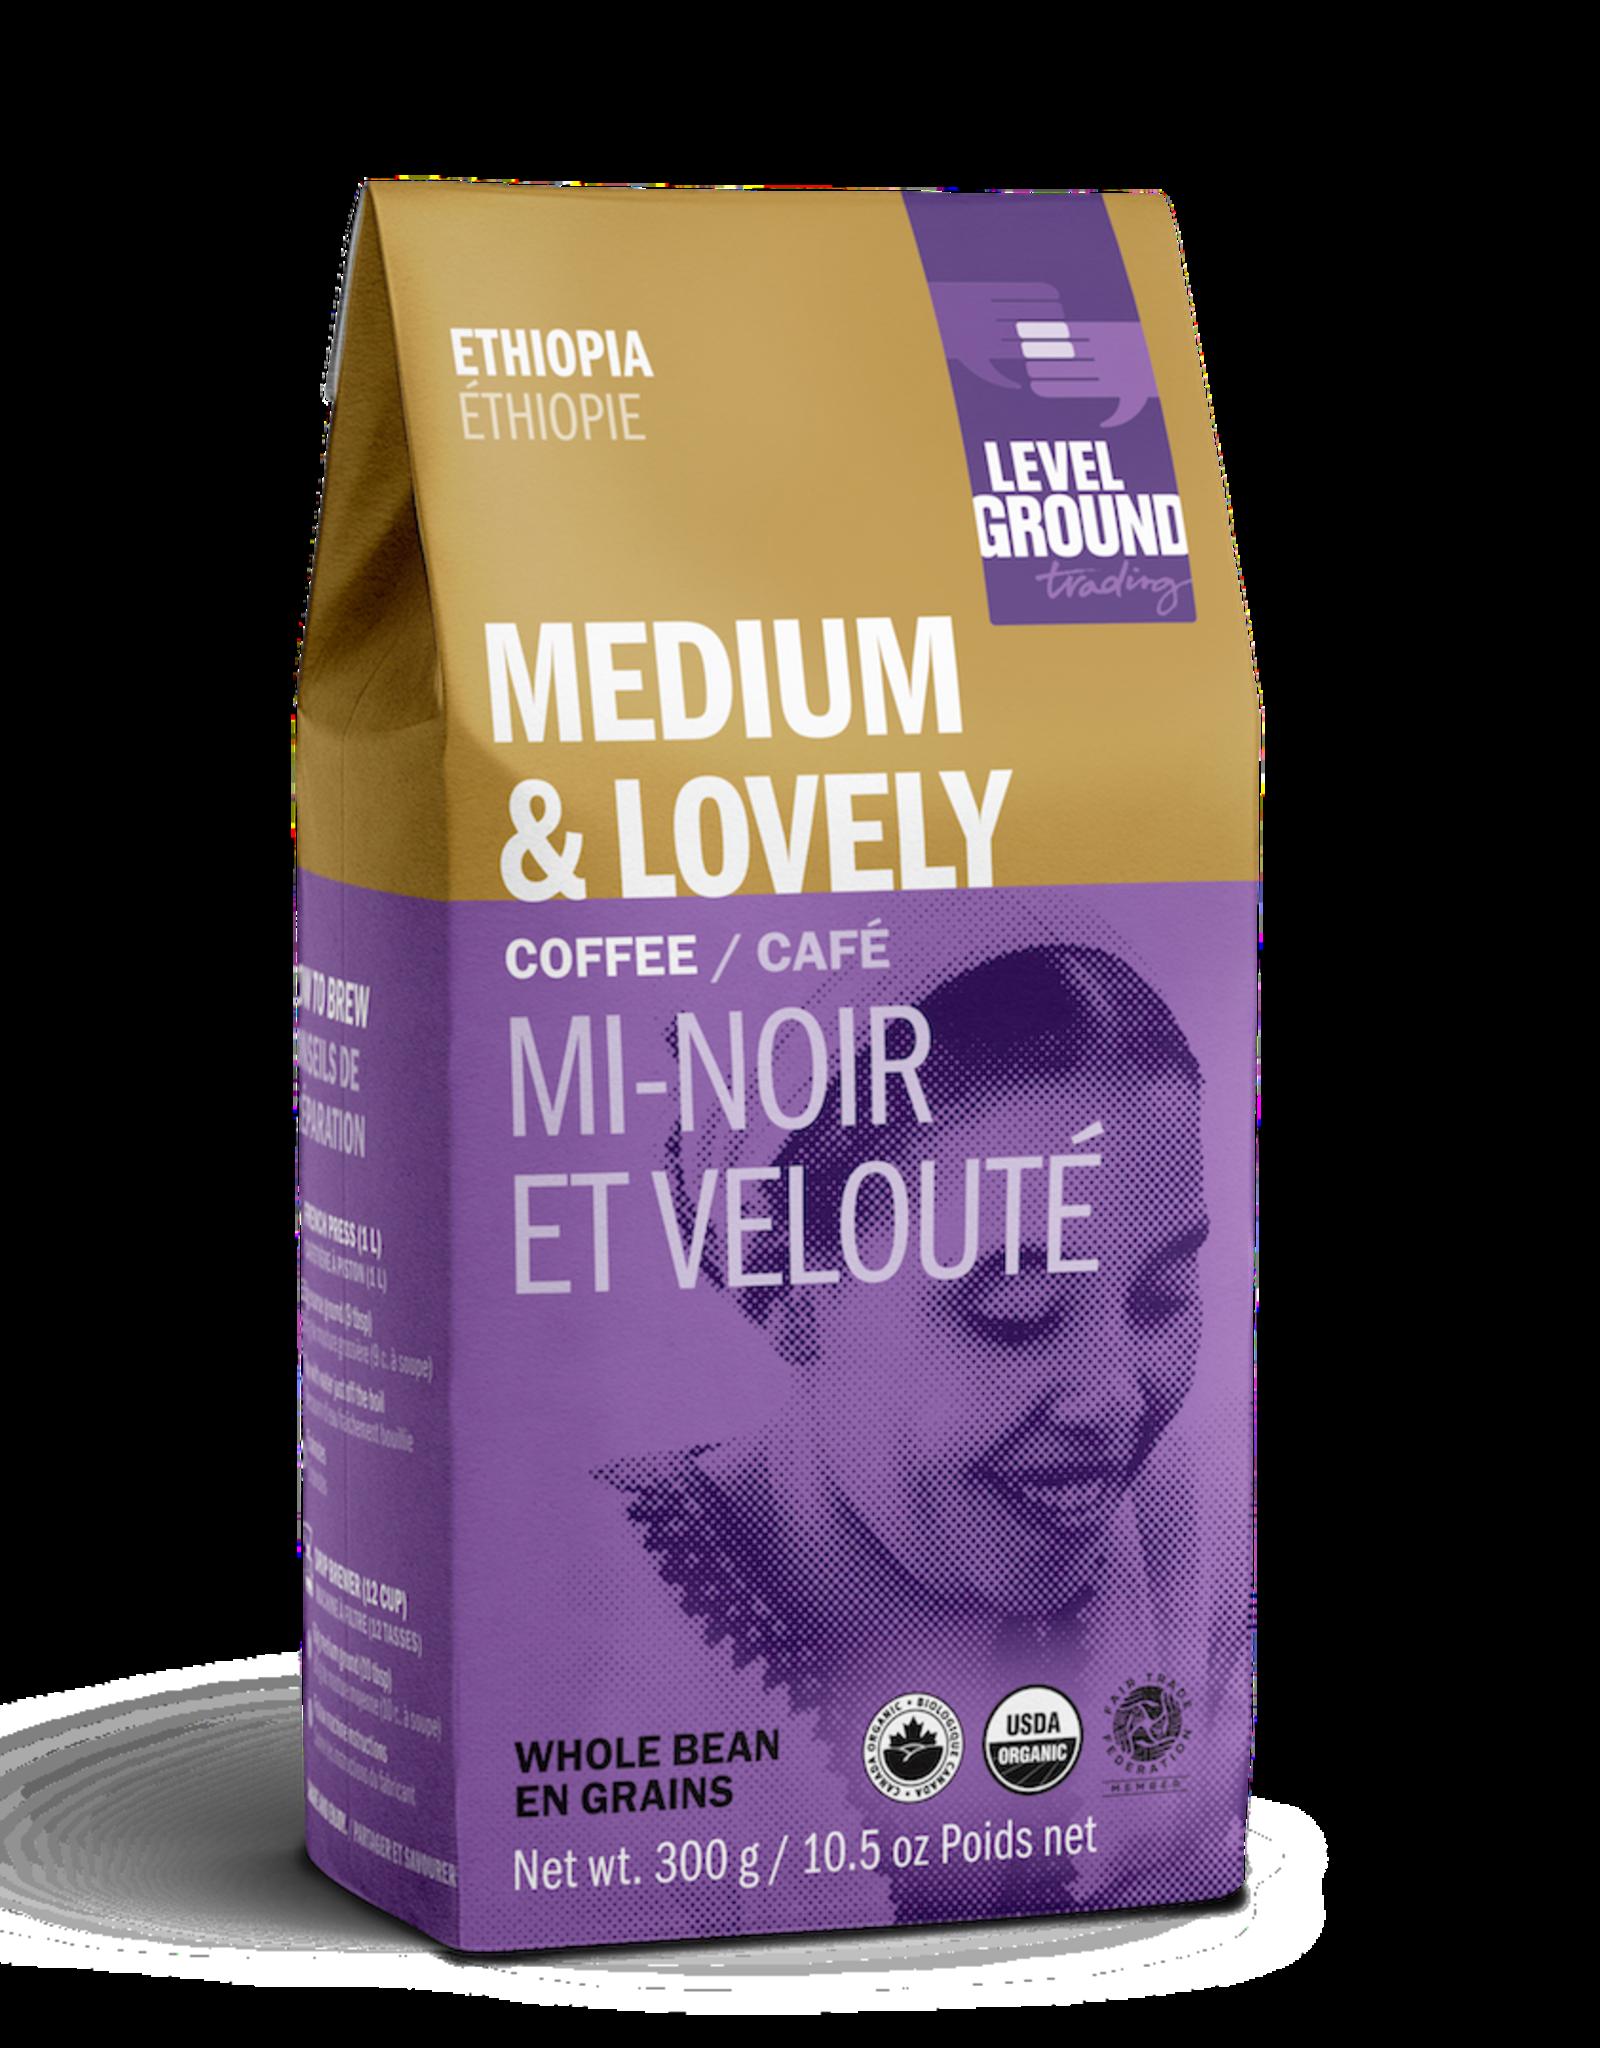 Level Ground Coffee, Ethiopia Medium Roast, Bean 300g